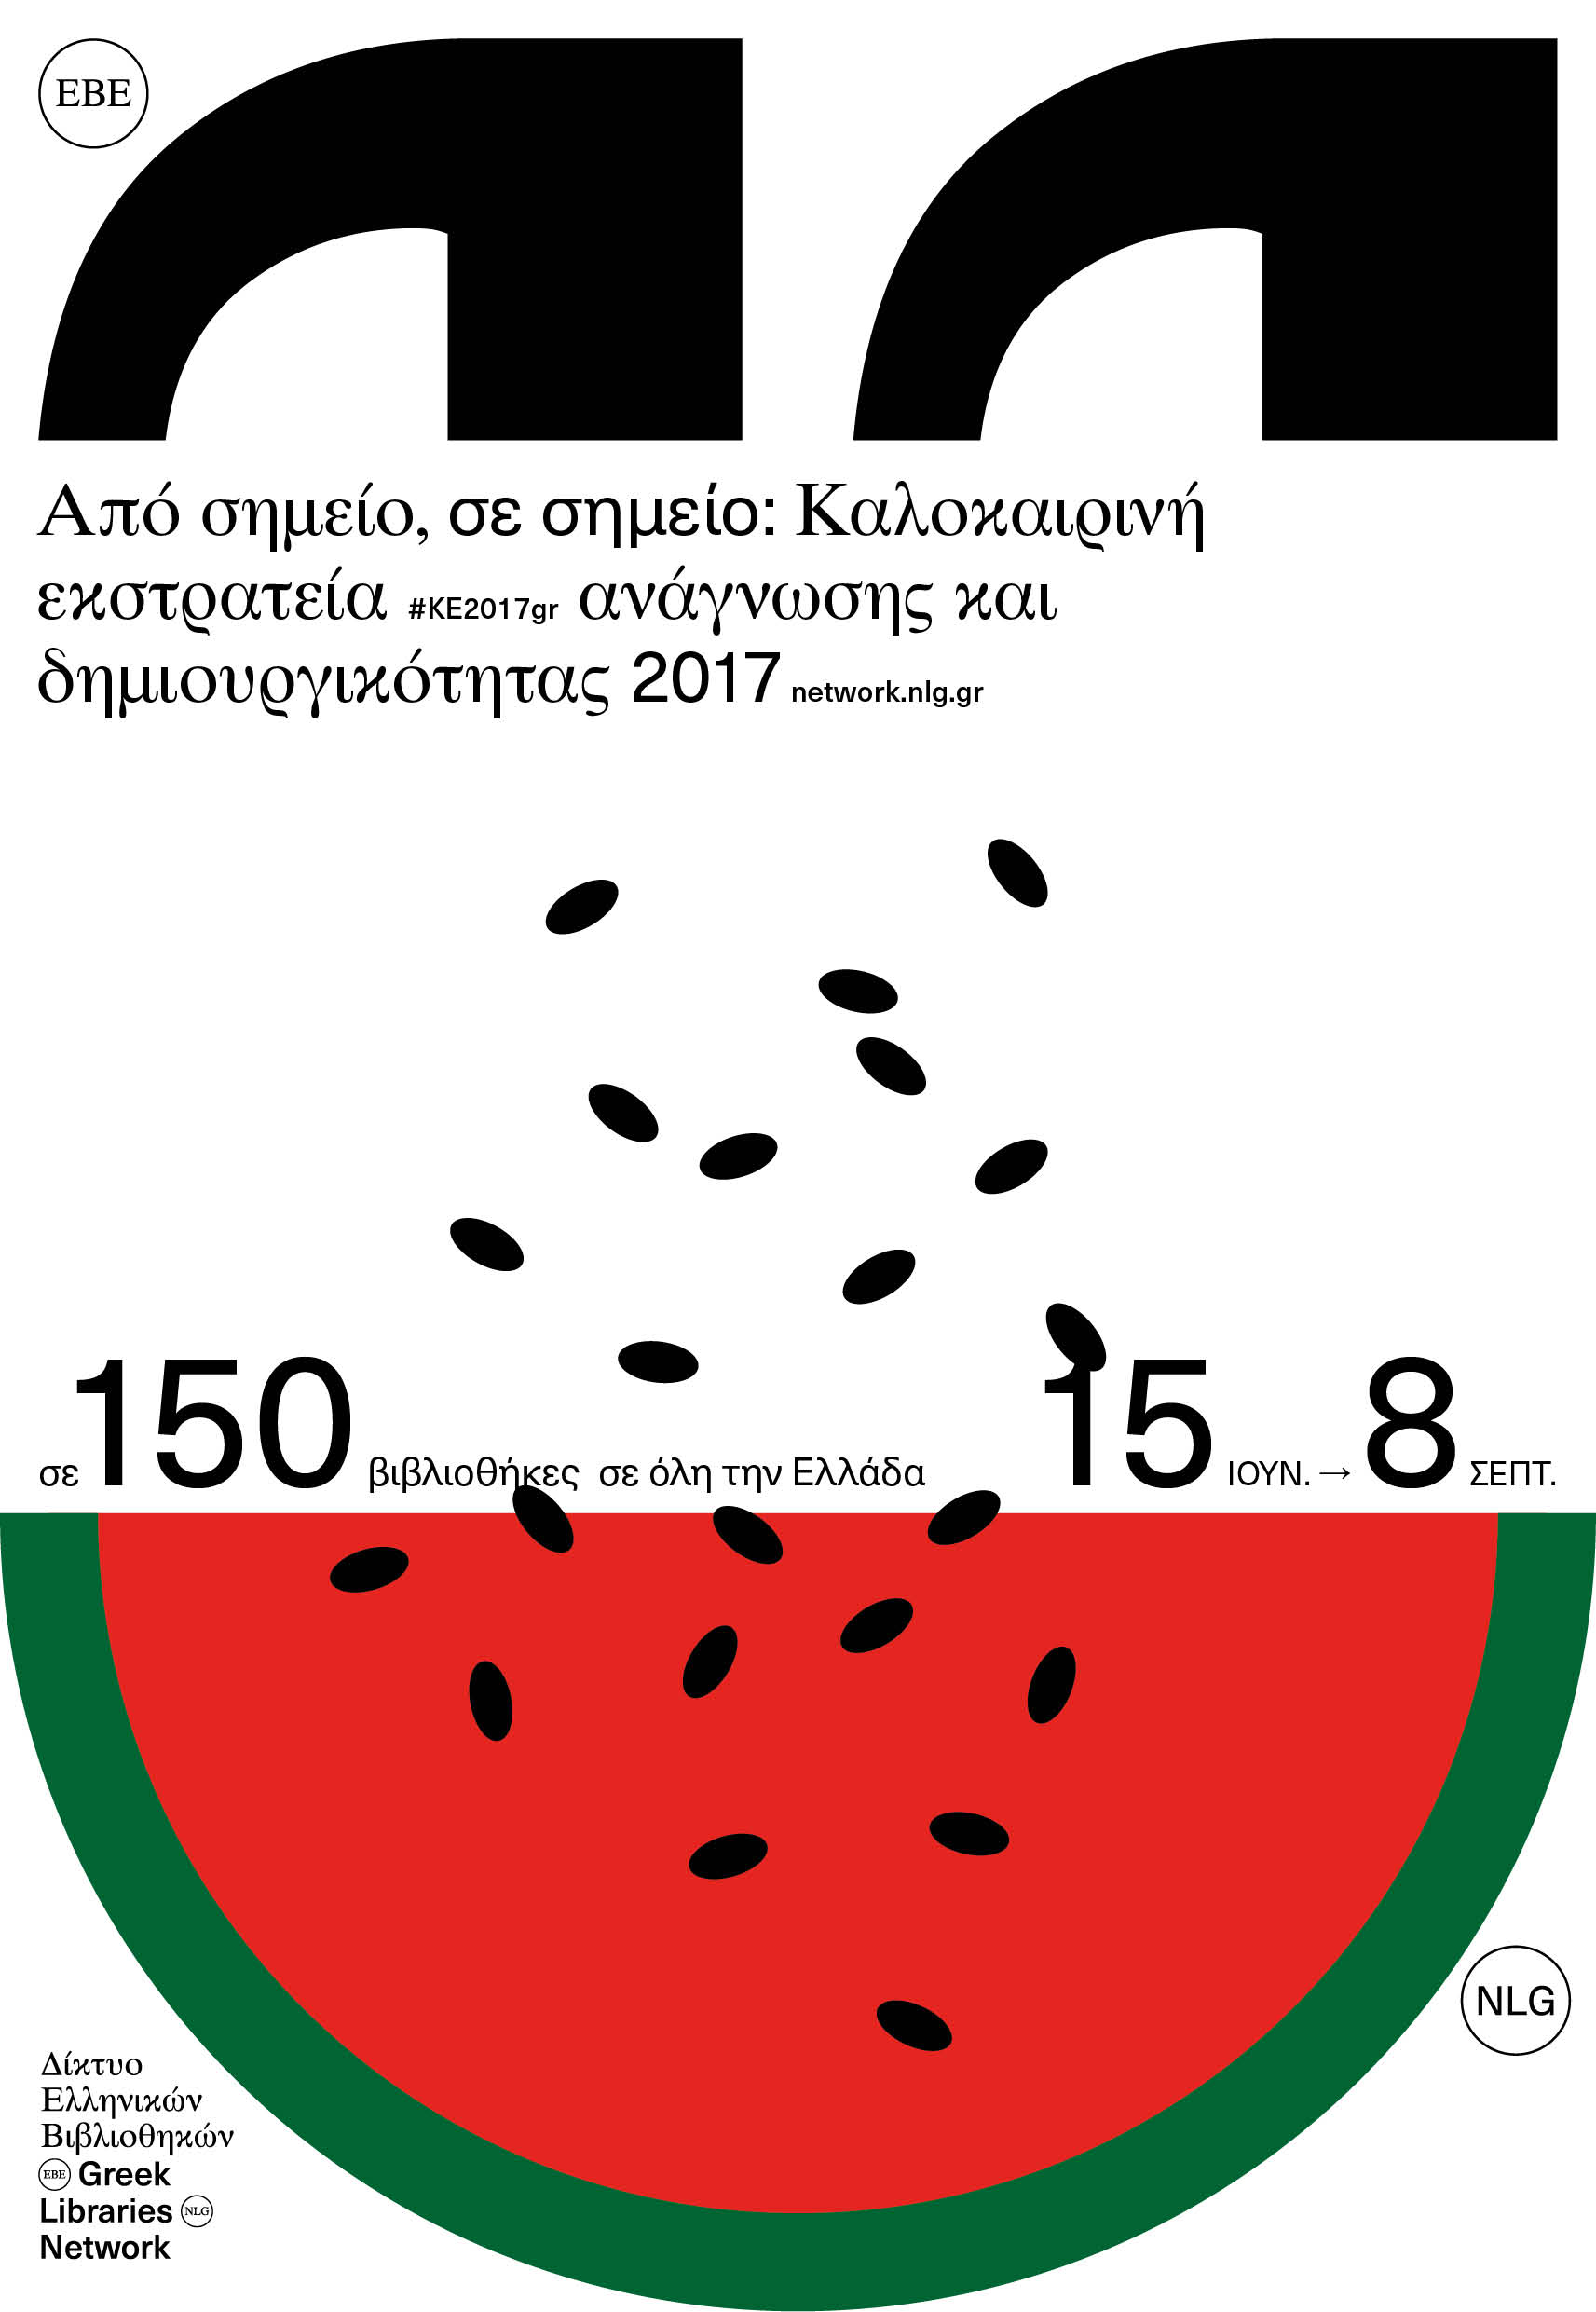 KE2017 poster